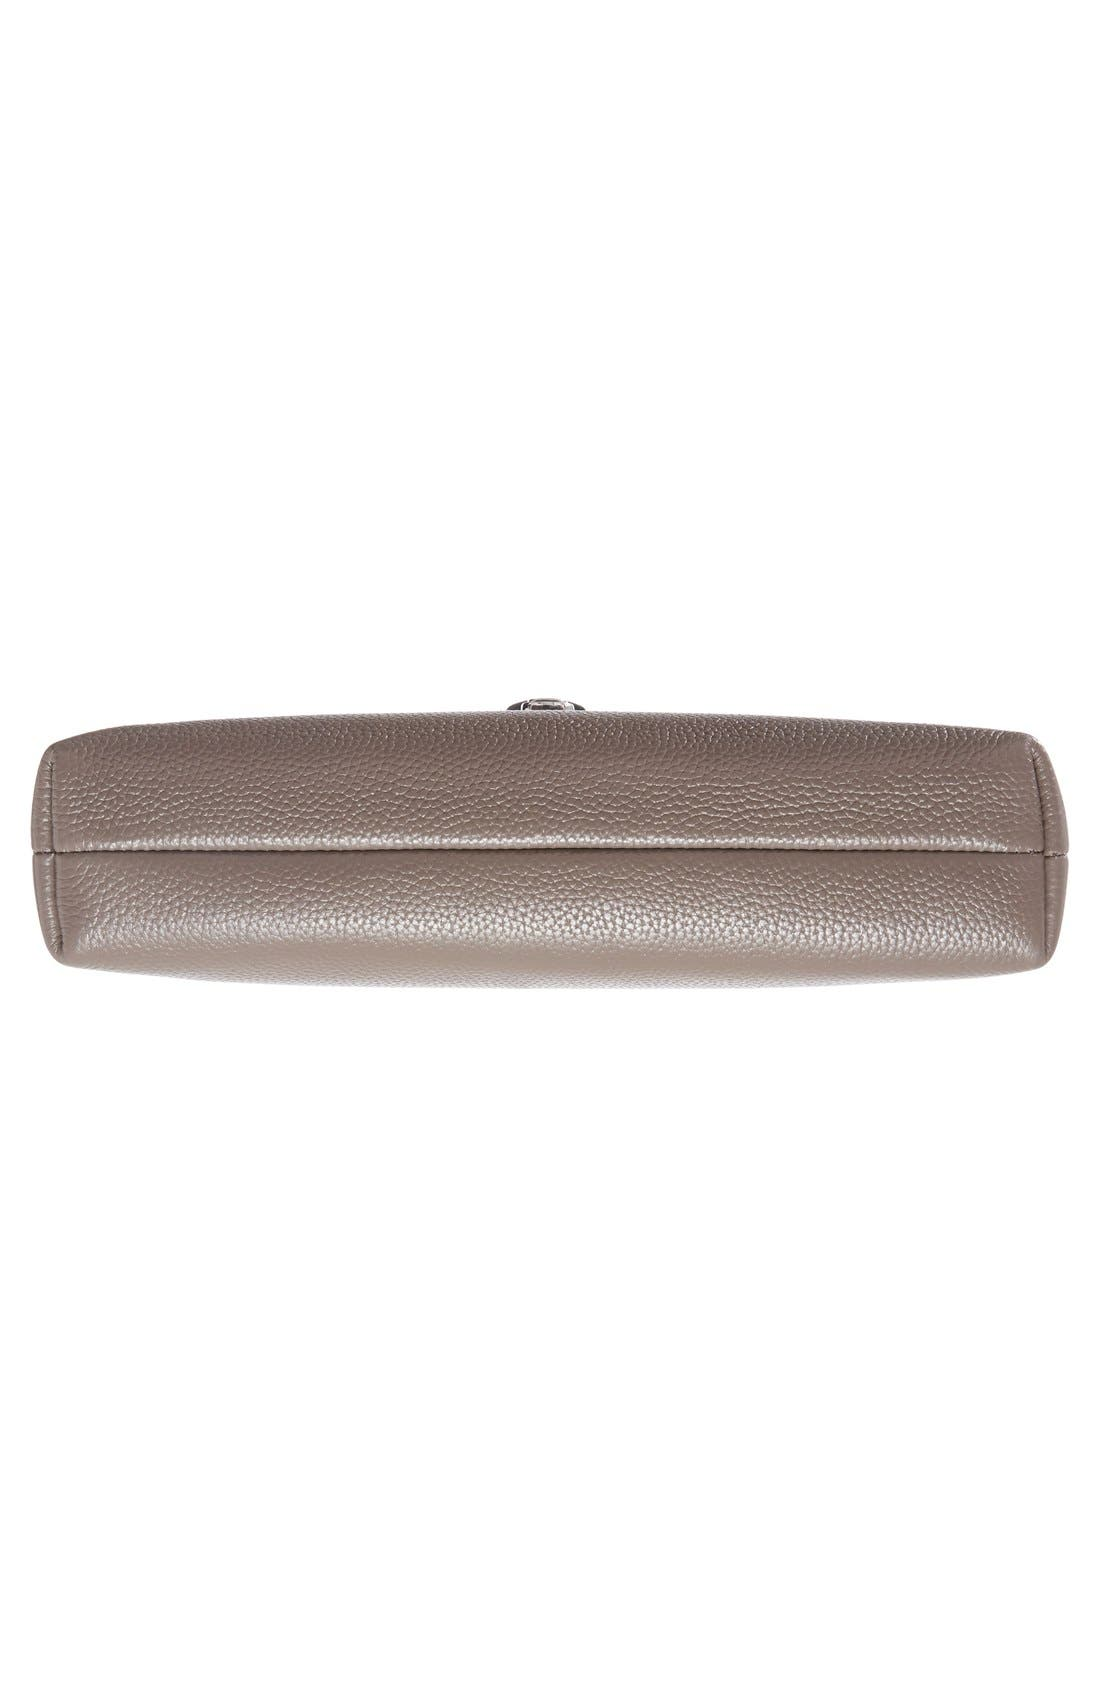 Large Mercer Leather Crossbody Bag,                             Alternate thumbnail 2, color,                             513